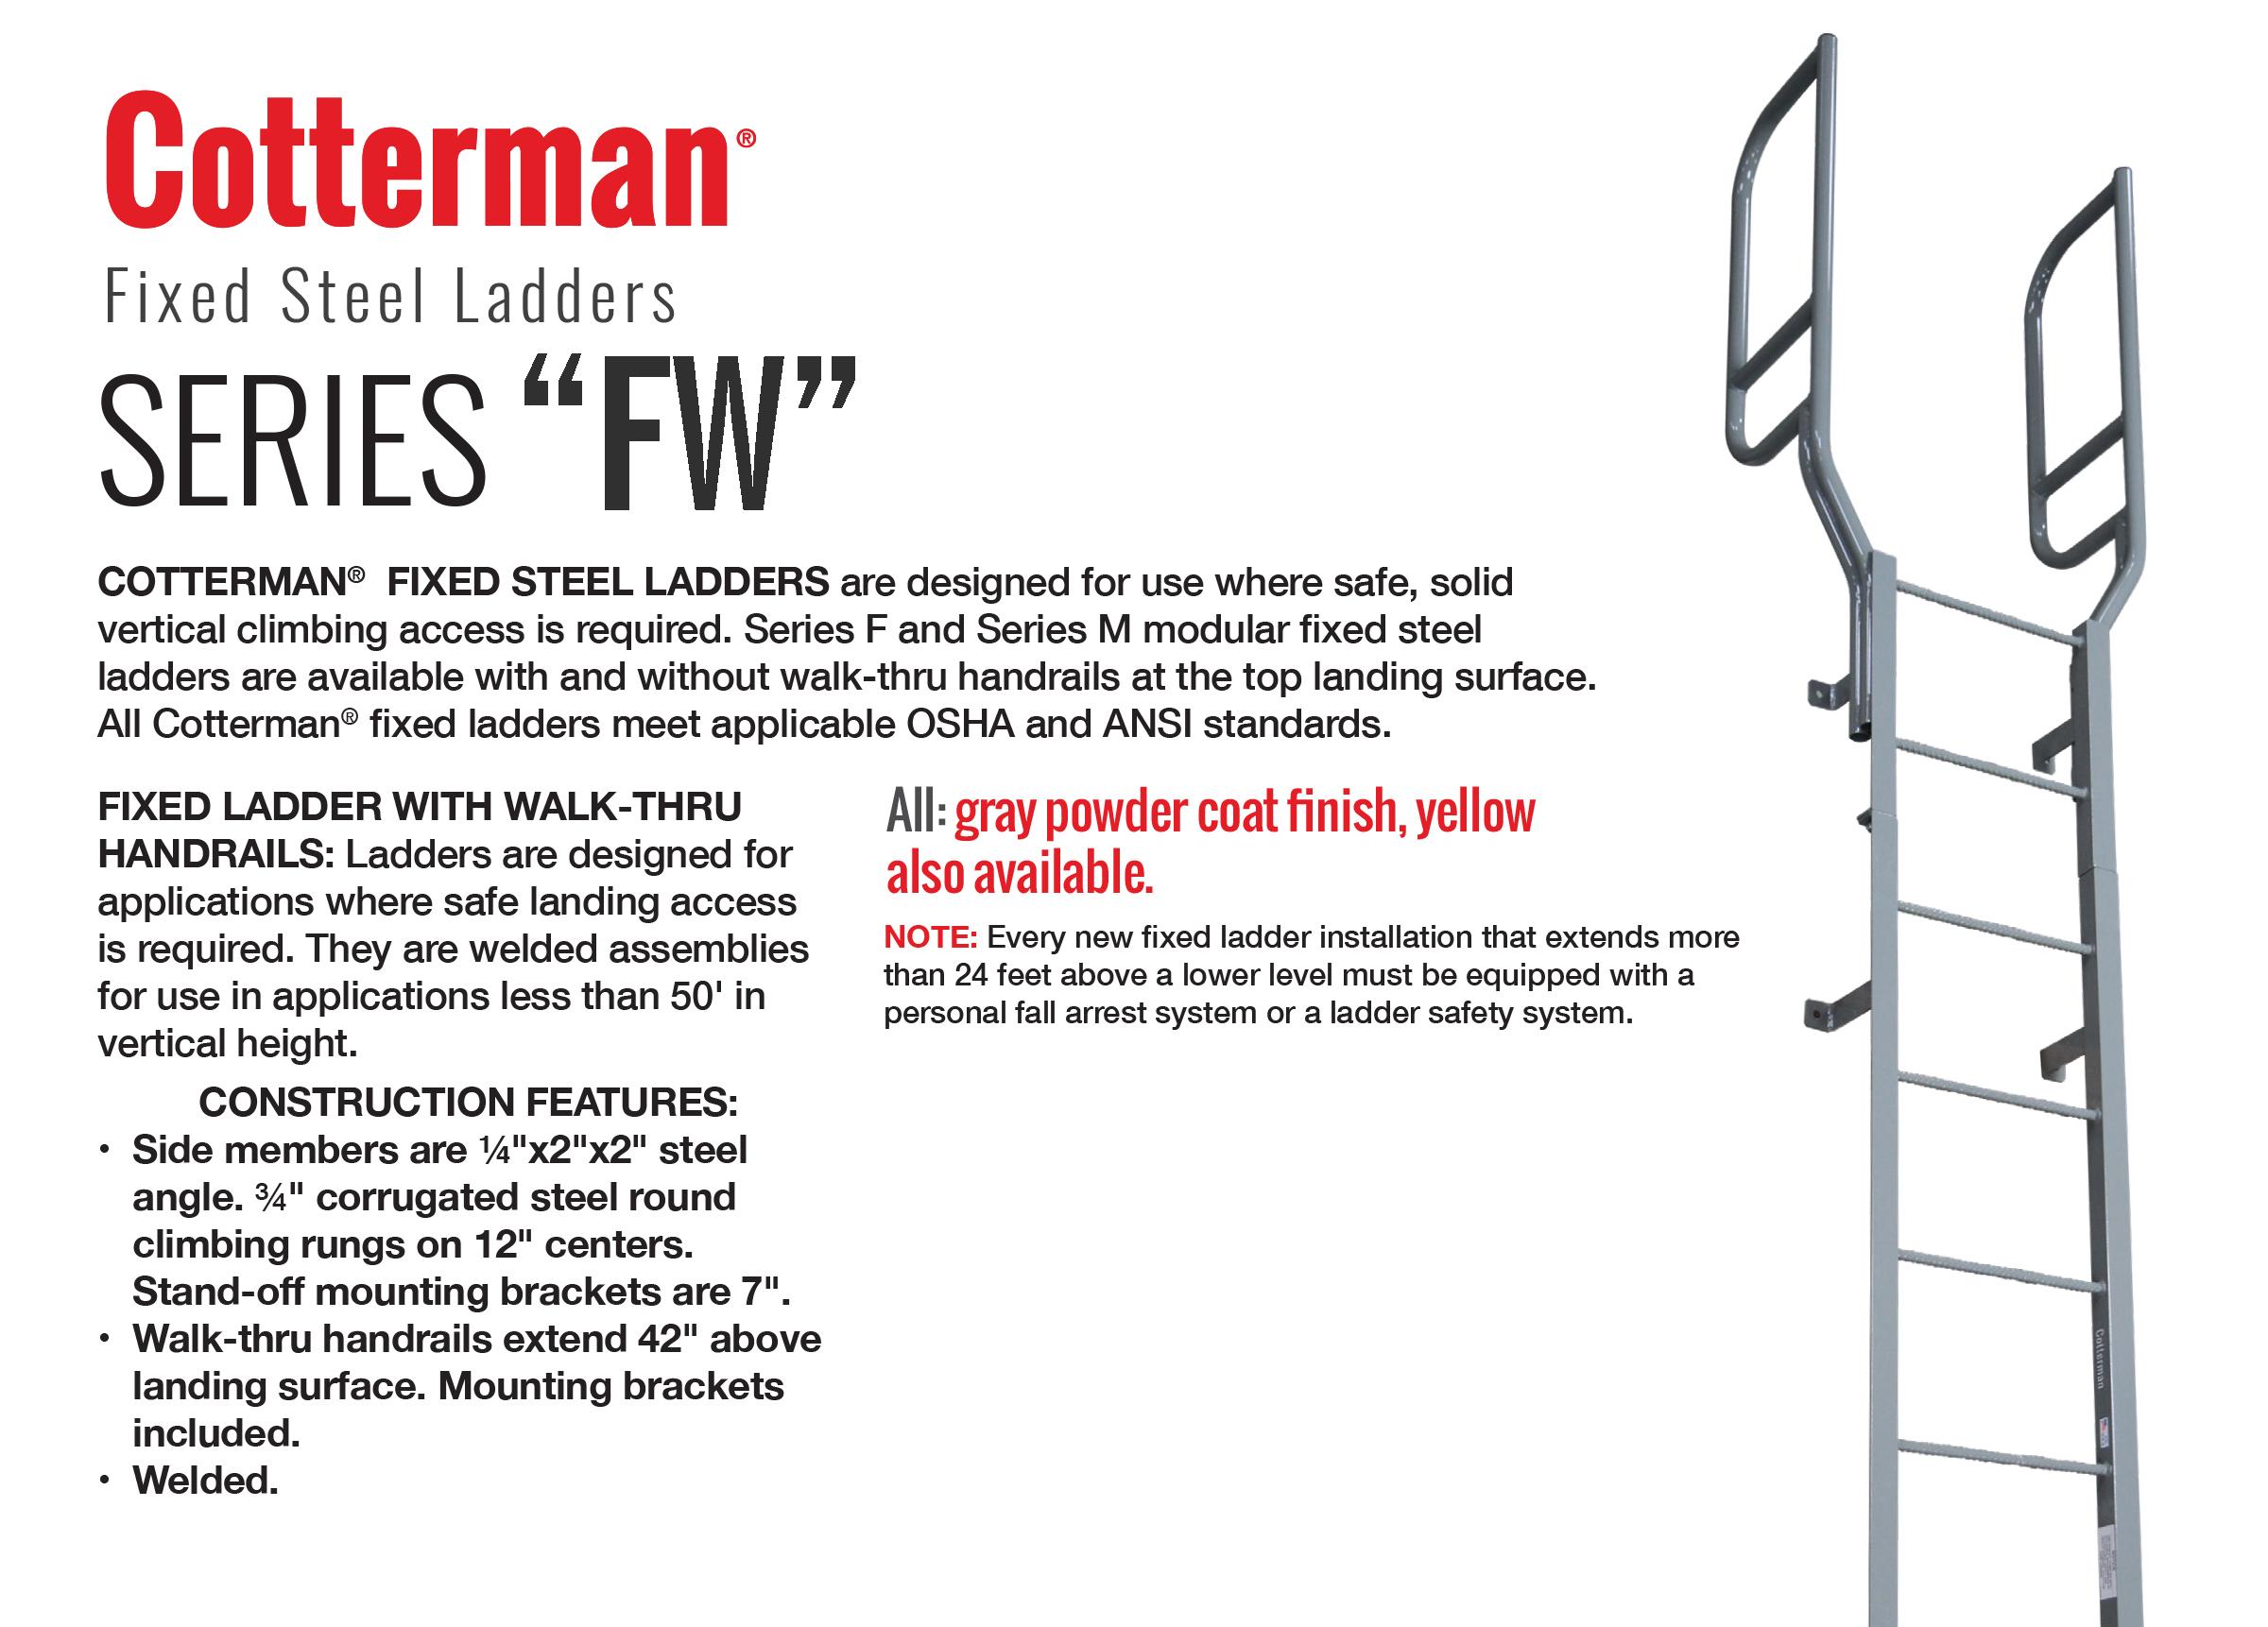 cotterman-fw-series-specs.jpg